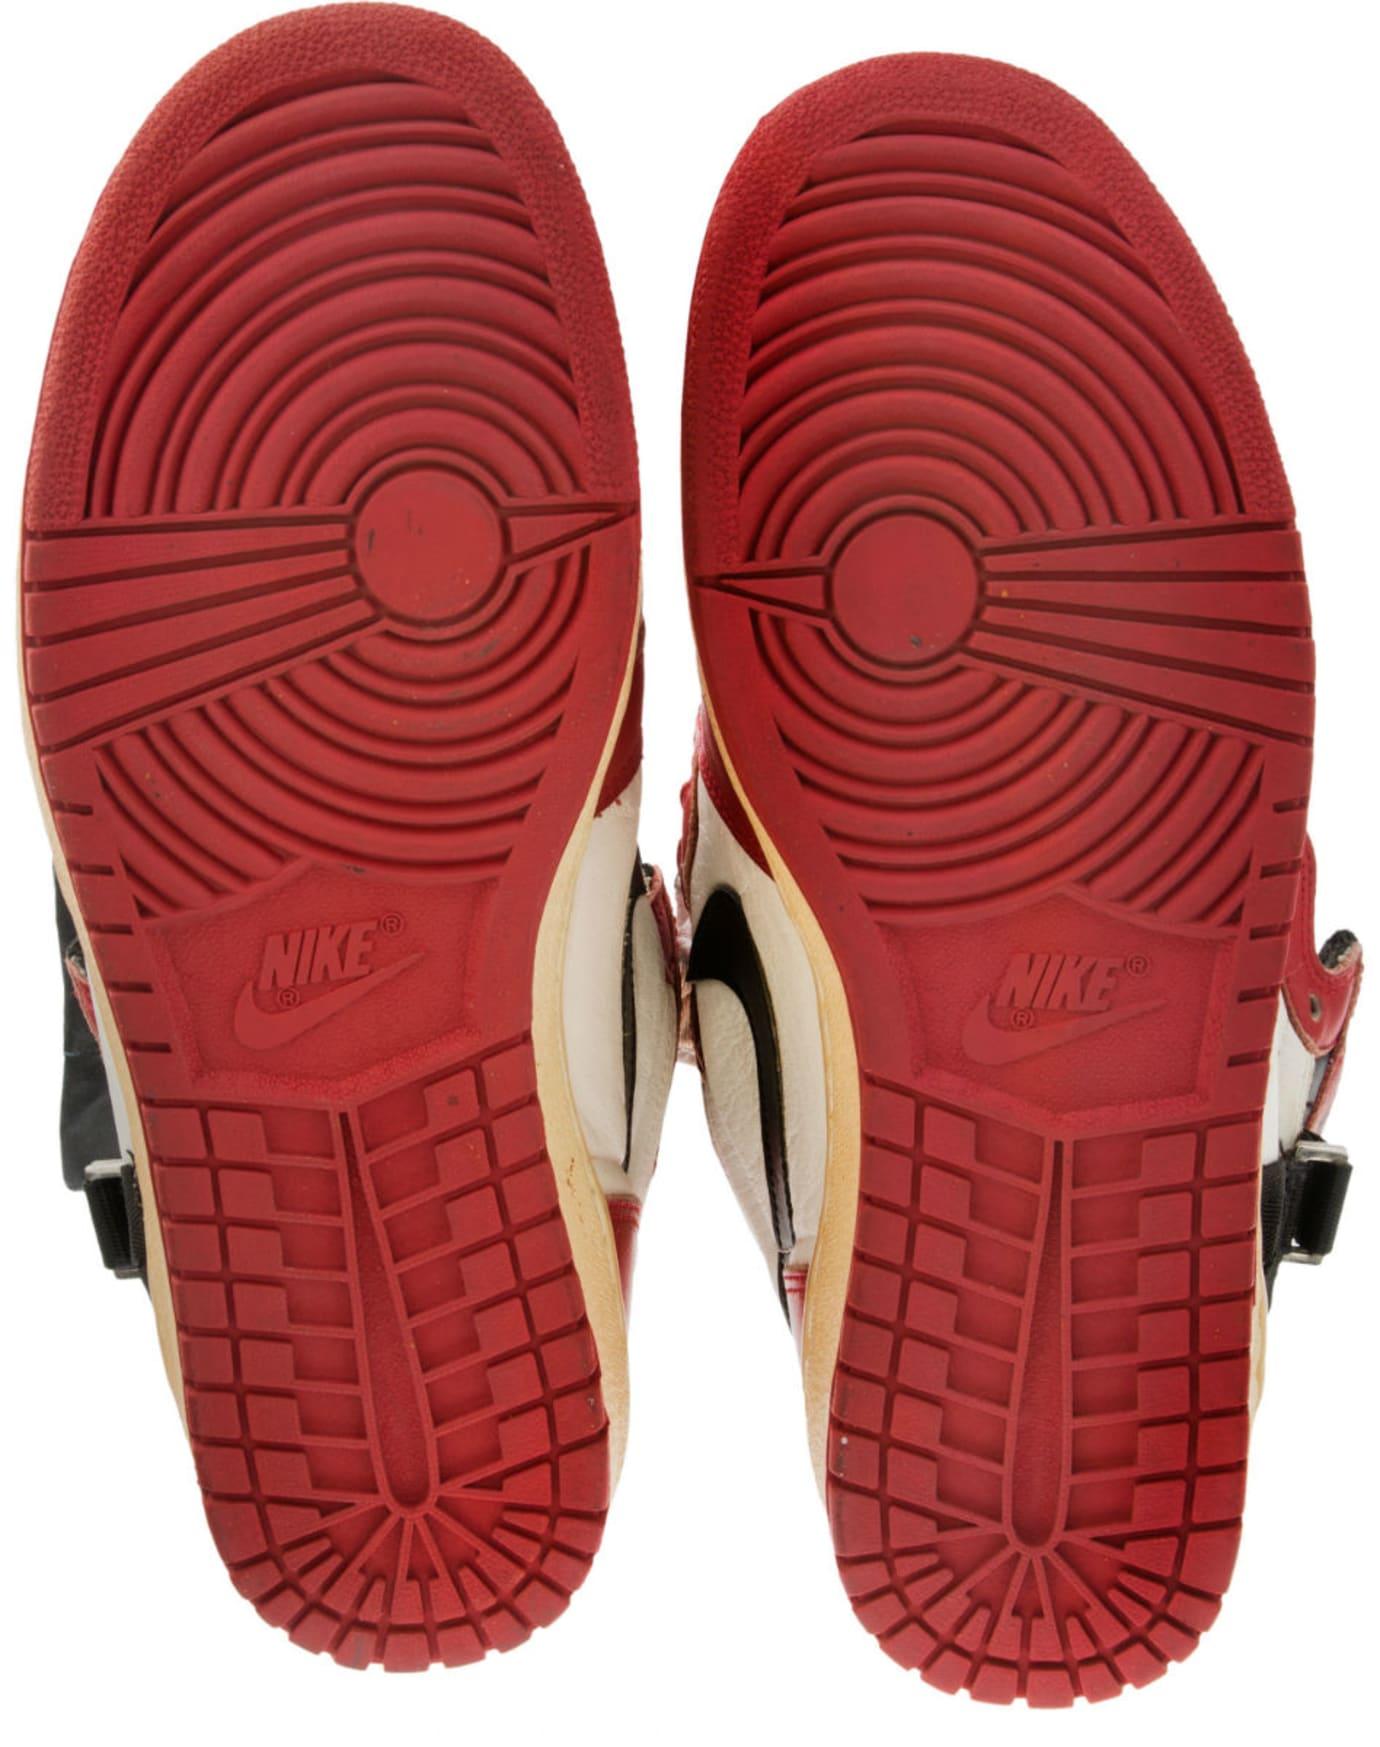 Air Jordan 1 Straps Injury Sample Auction Sole